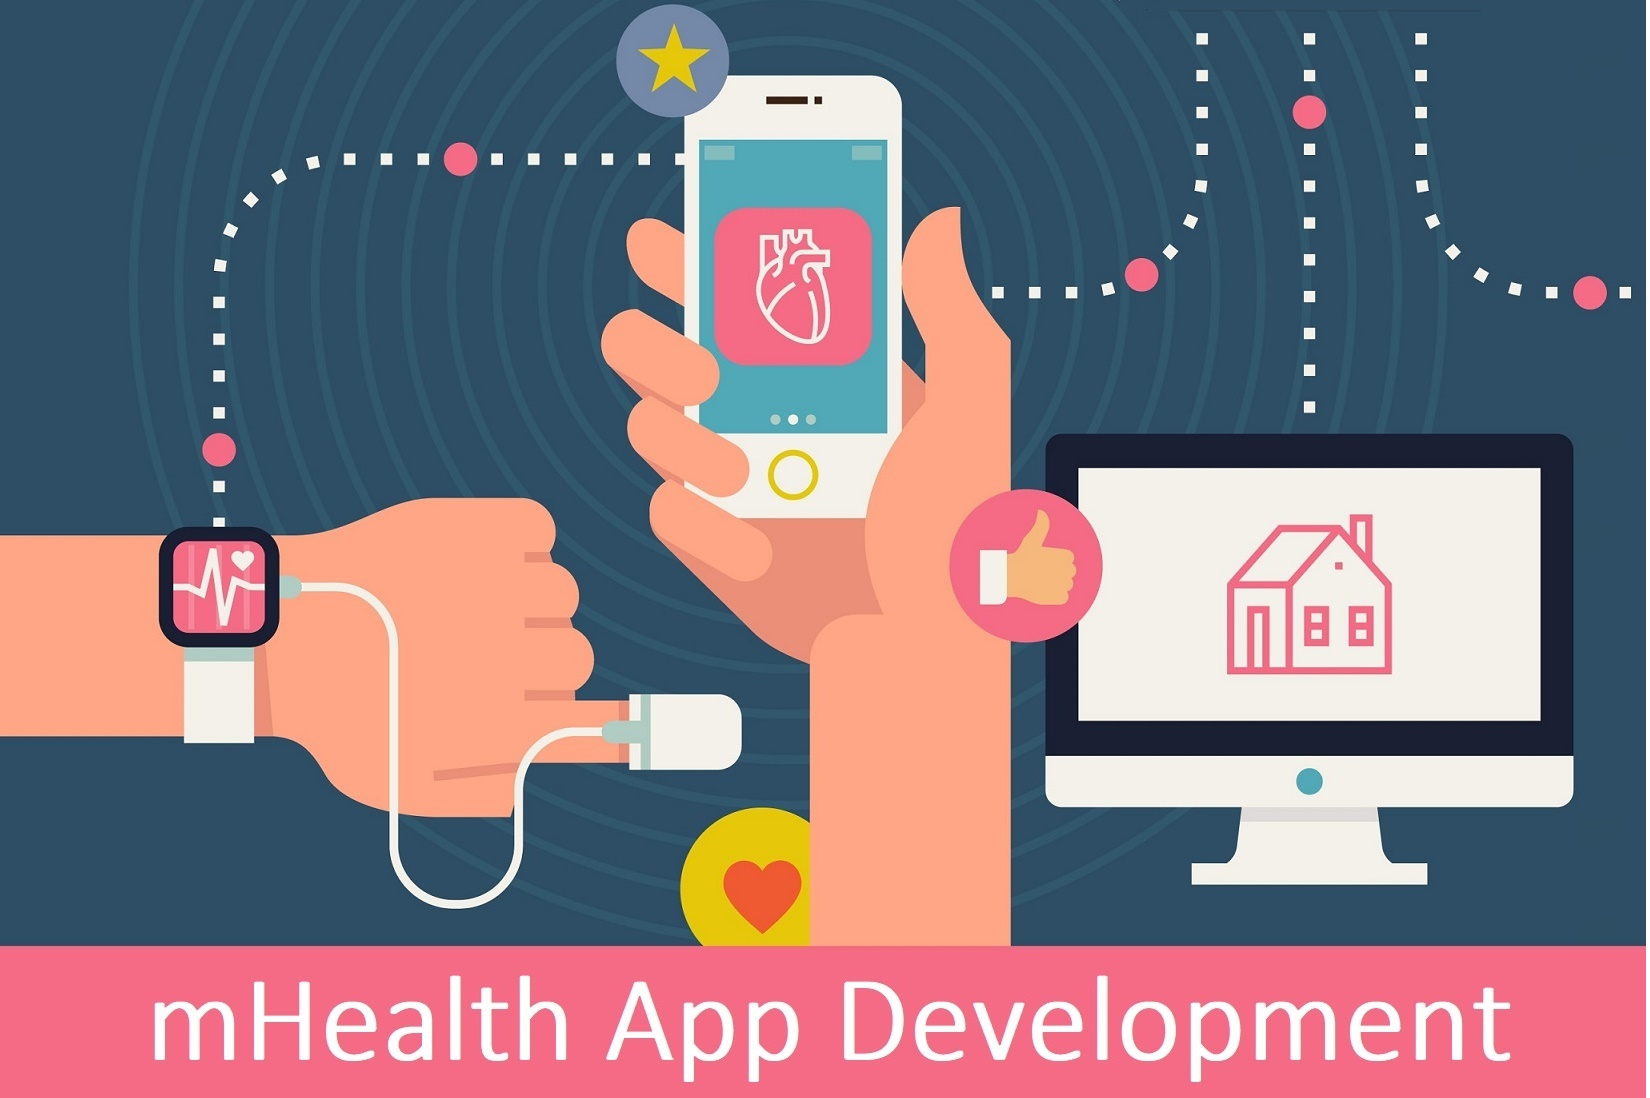 mHealth App Development